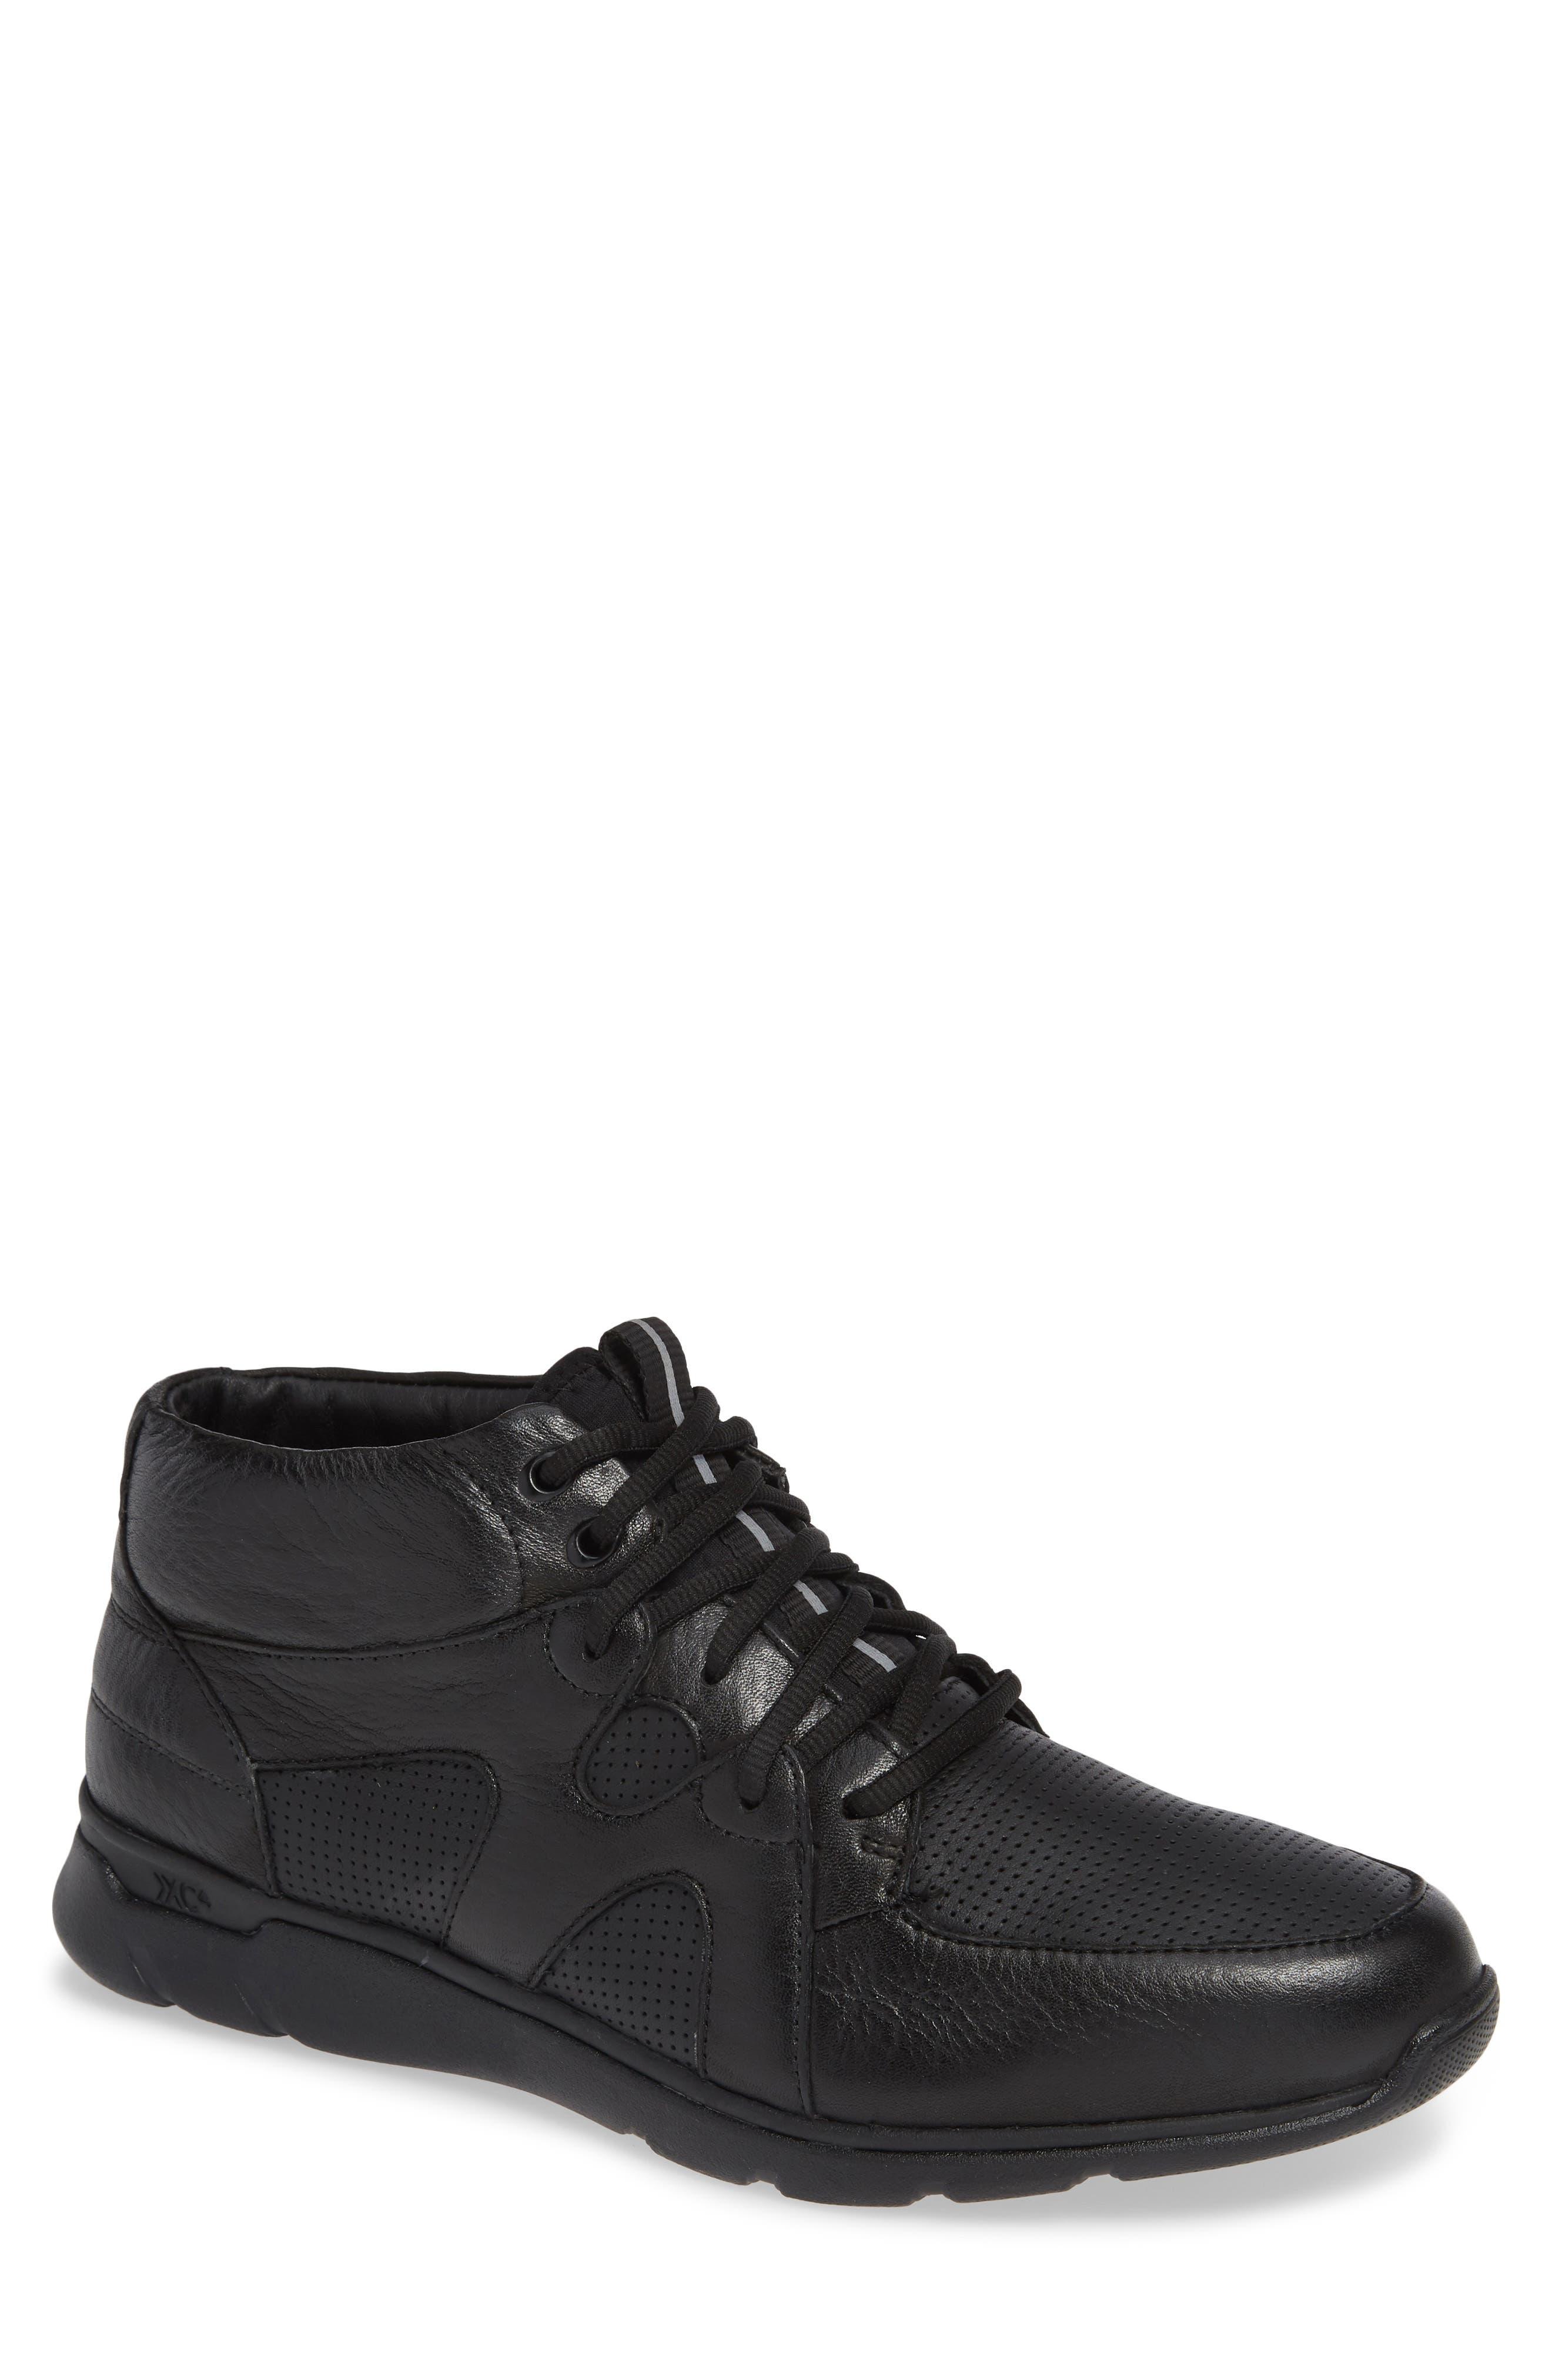 JOHNSTON & MURPHY, Prentiss Waterproof Sneaker, Main thumbnail 1, color, BLACK LEATHER